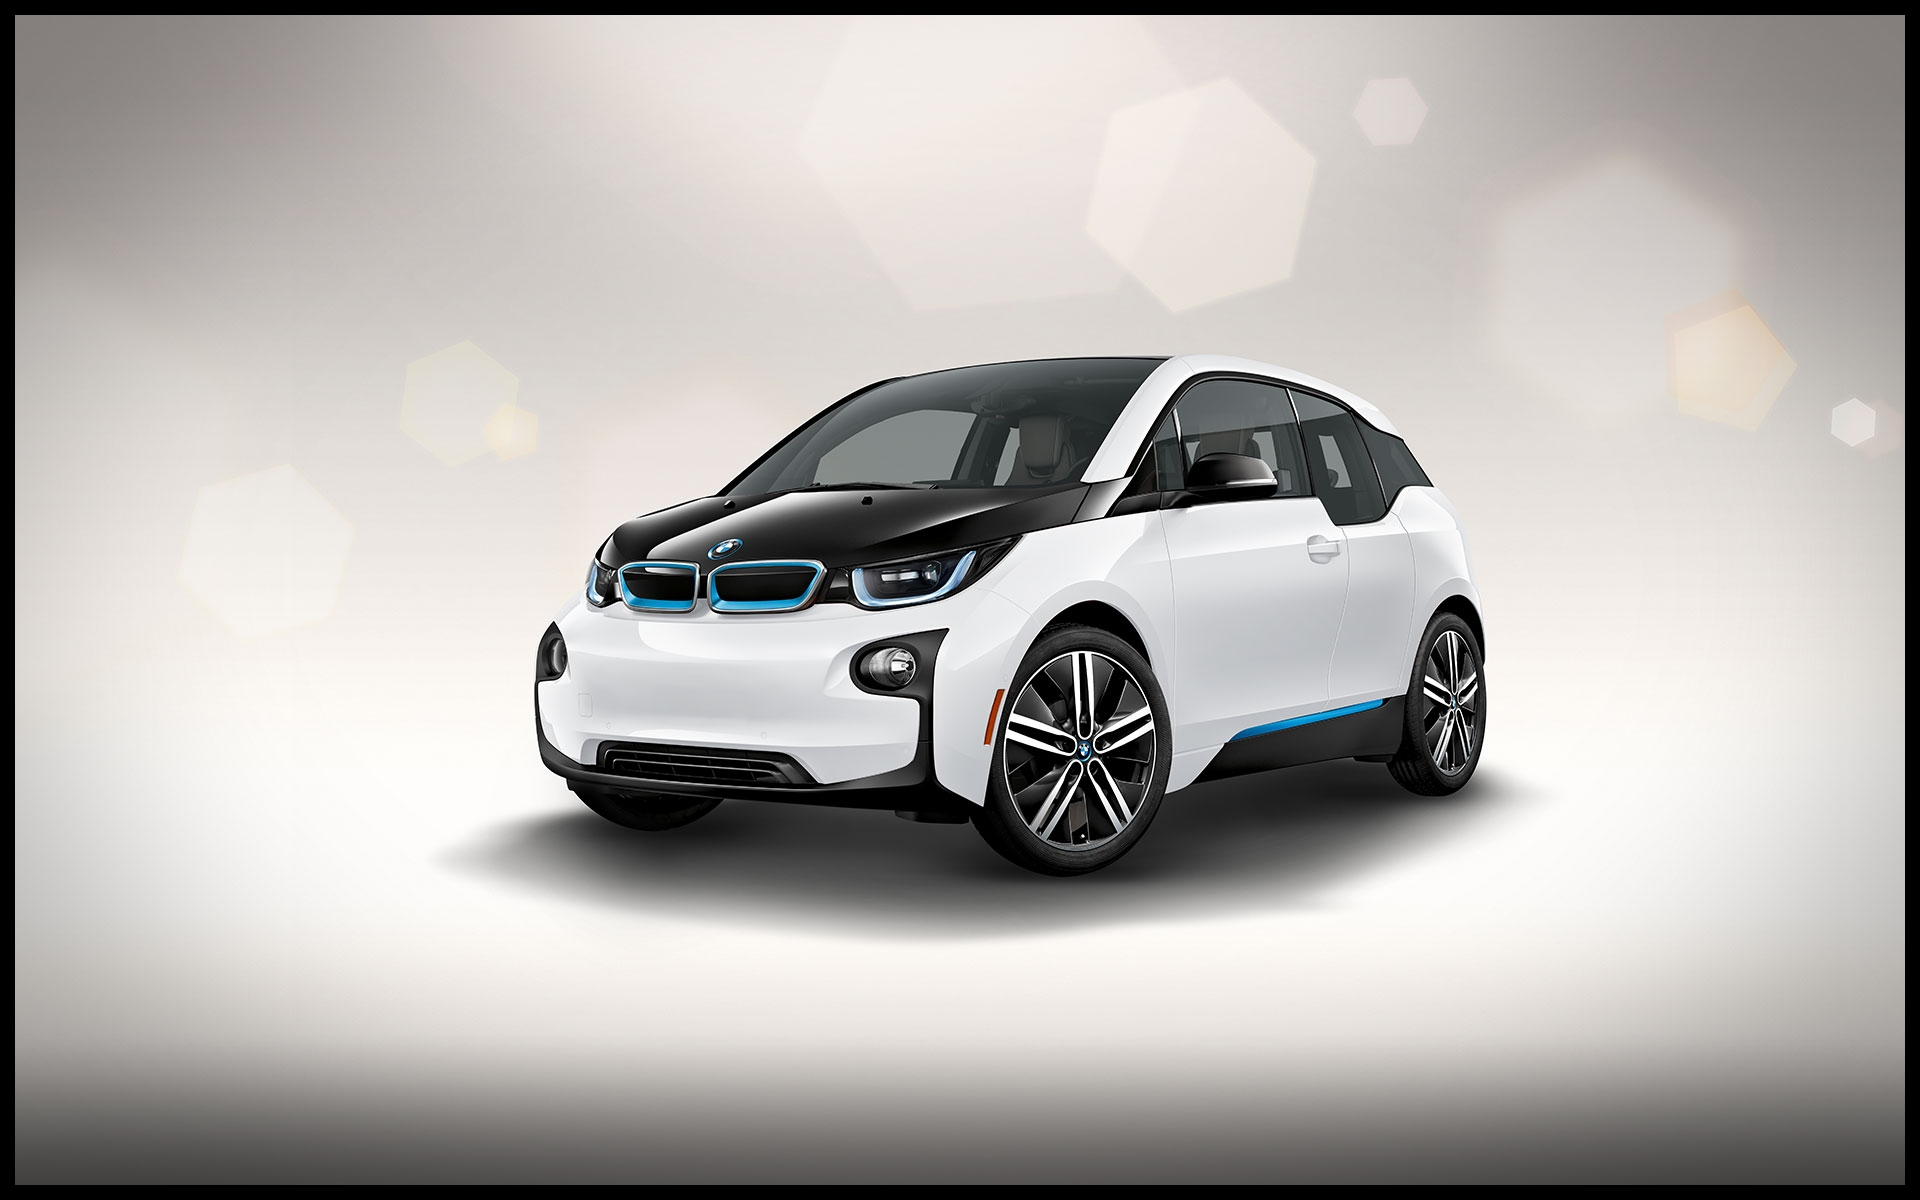 BMW i3 electric 2016 image 01